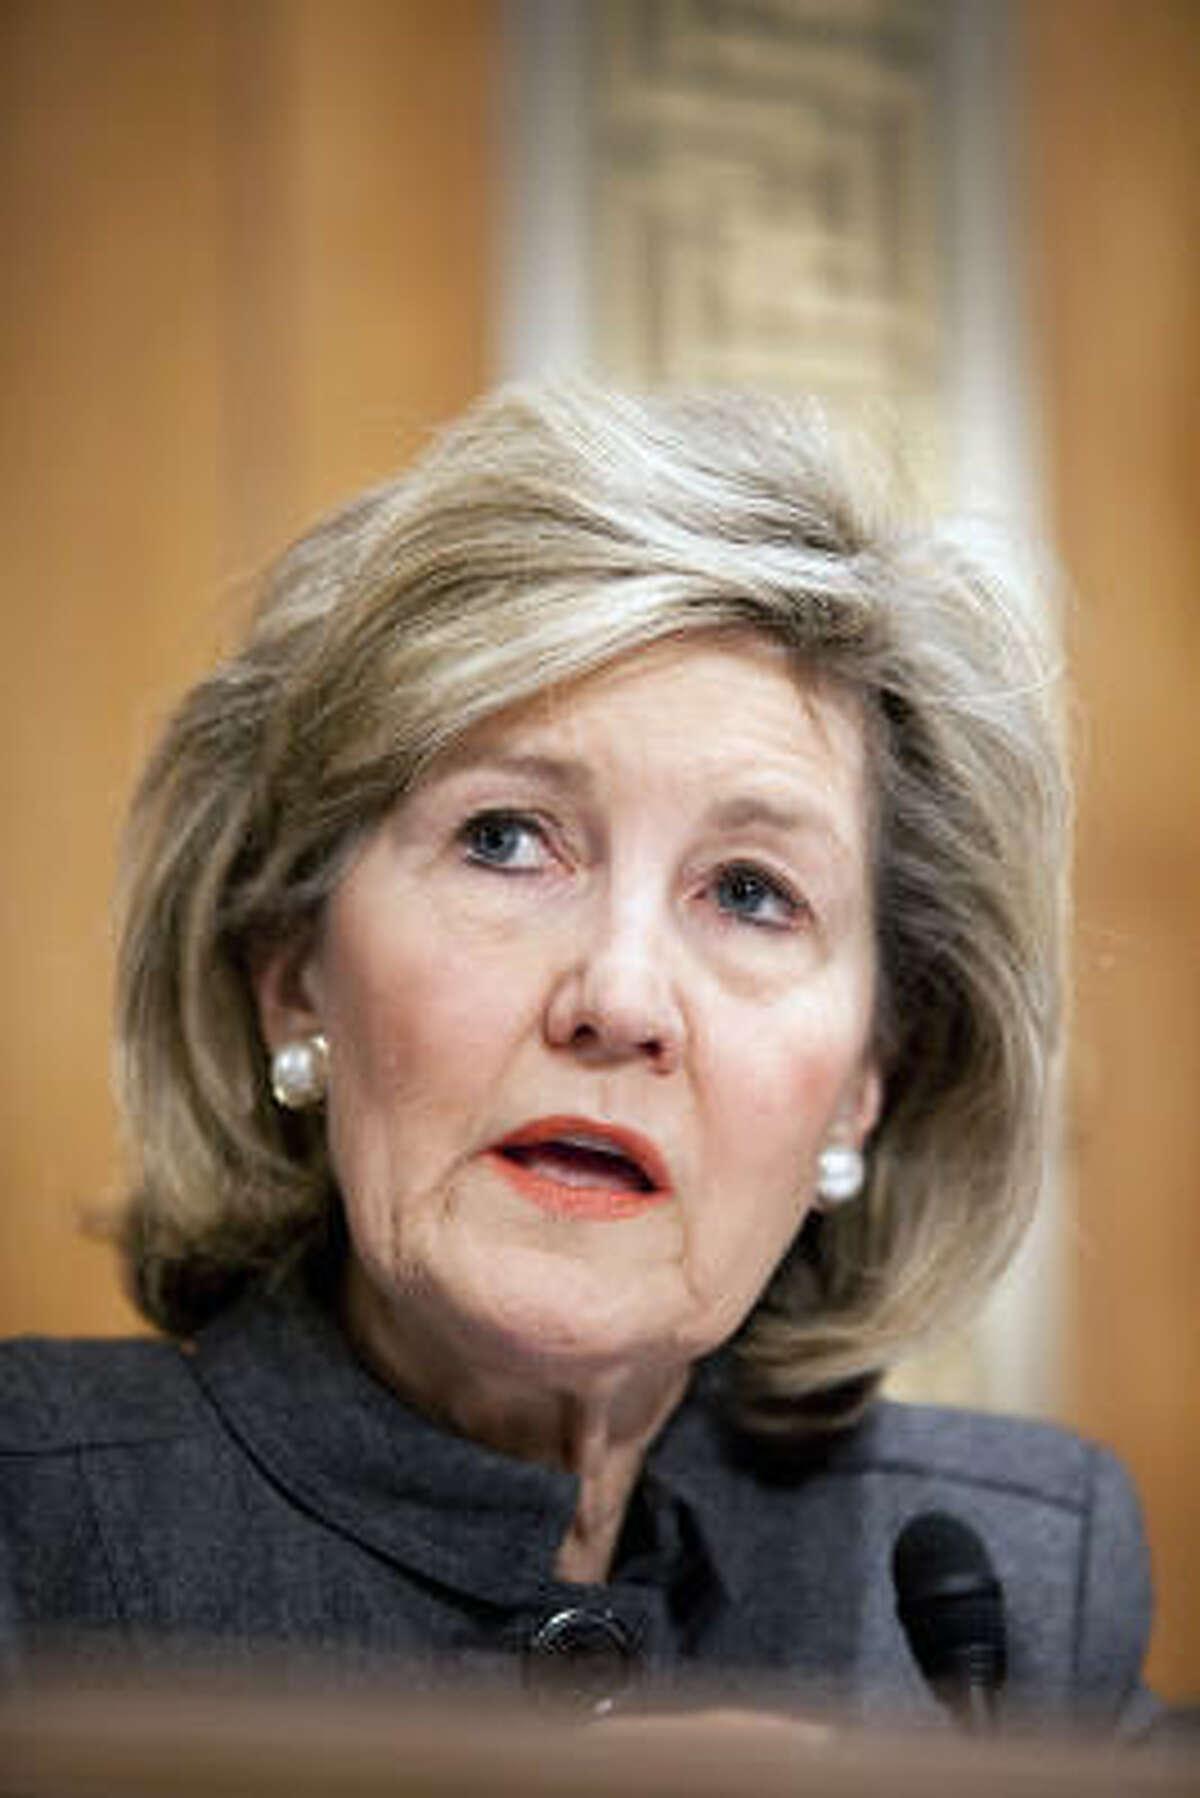 Texas Sen. Kay Bailey Hutchison said requiring health insurance is unconstitutional.